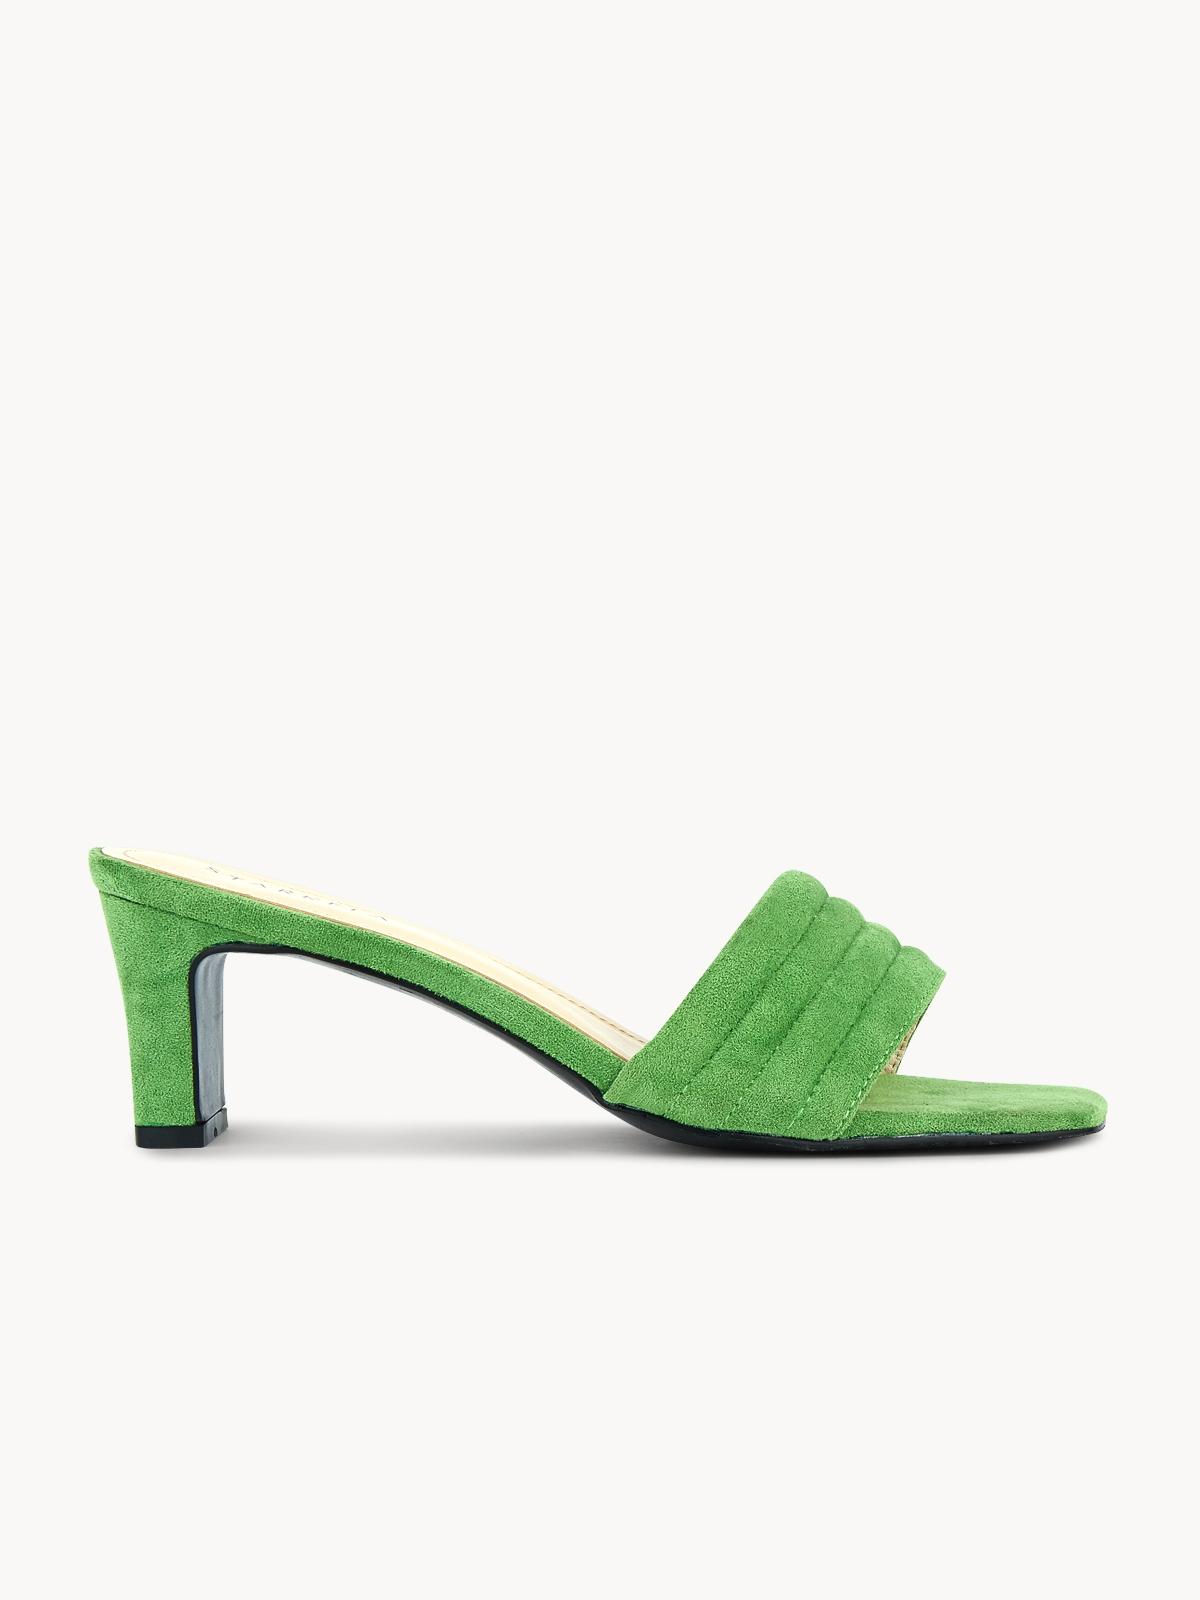 Starkela Sandal Mid Heels Green